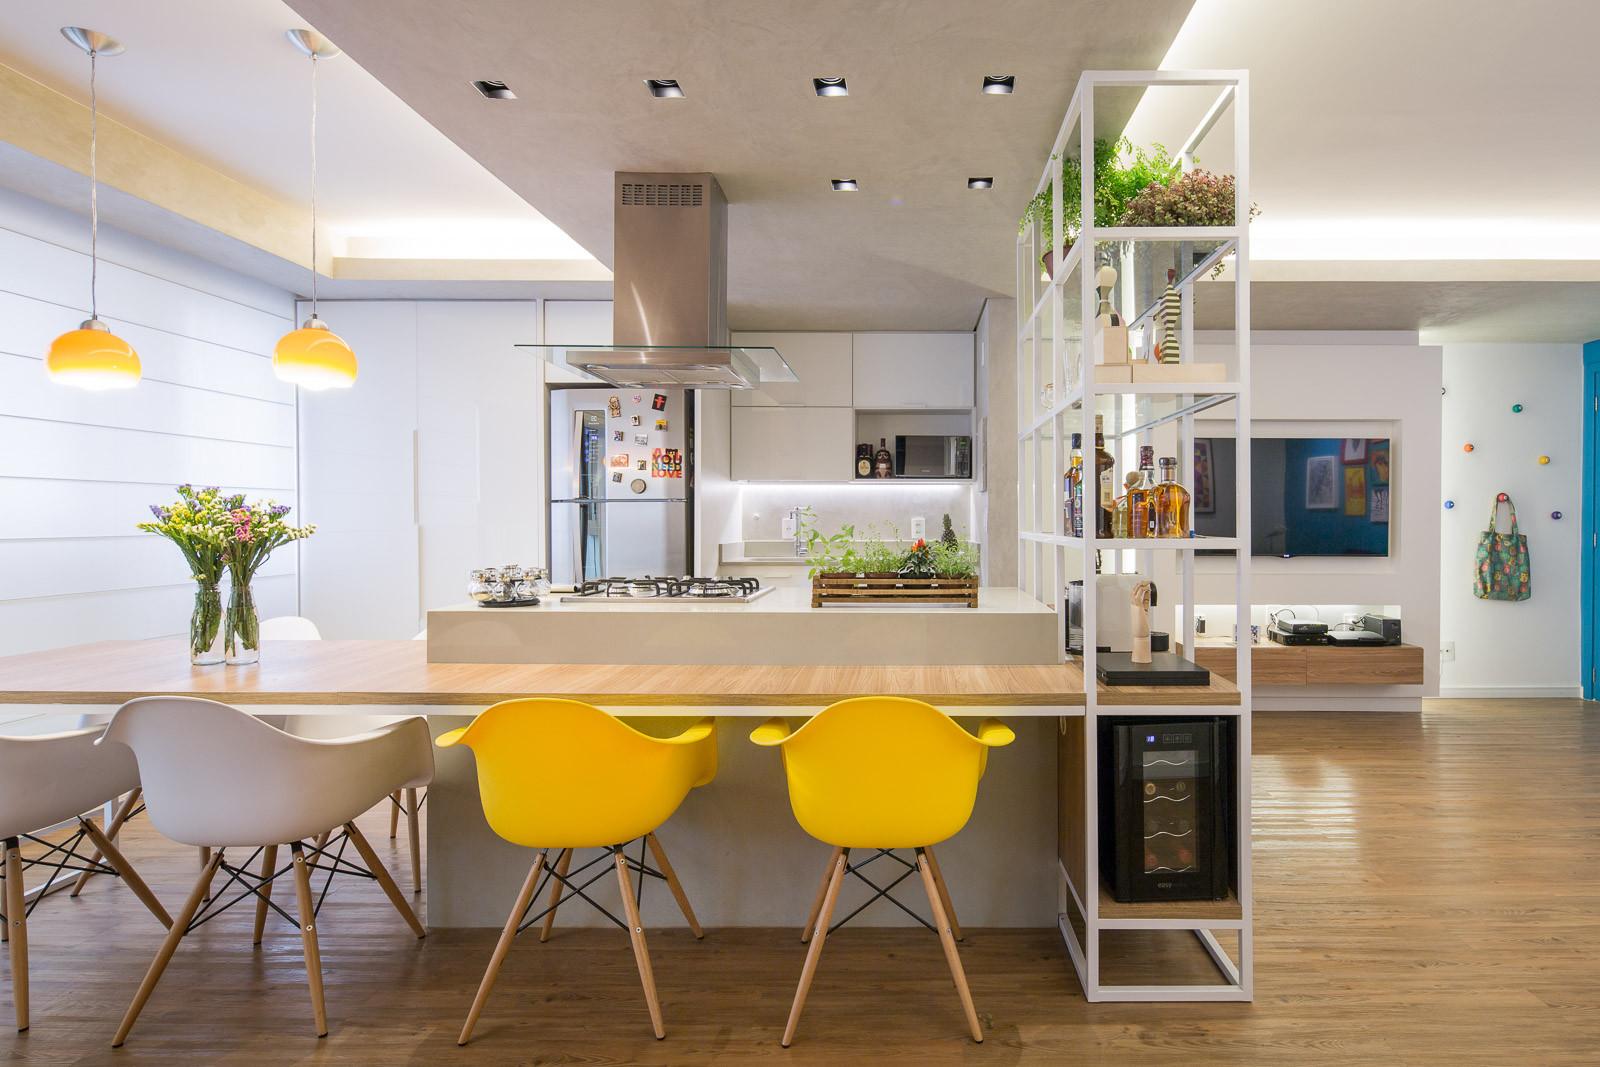 Departamento Trama / Semerene Arquitetura Interior, © Joana França